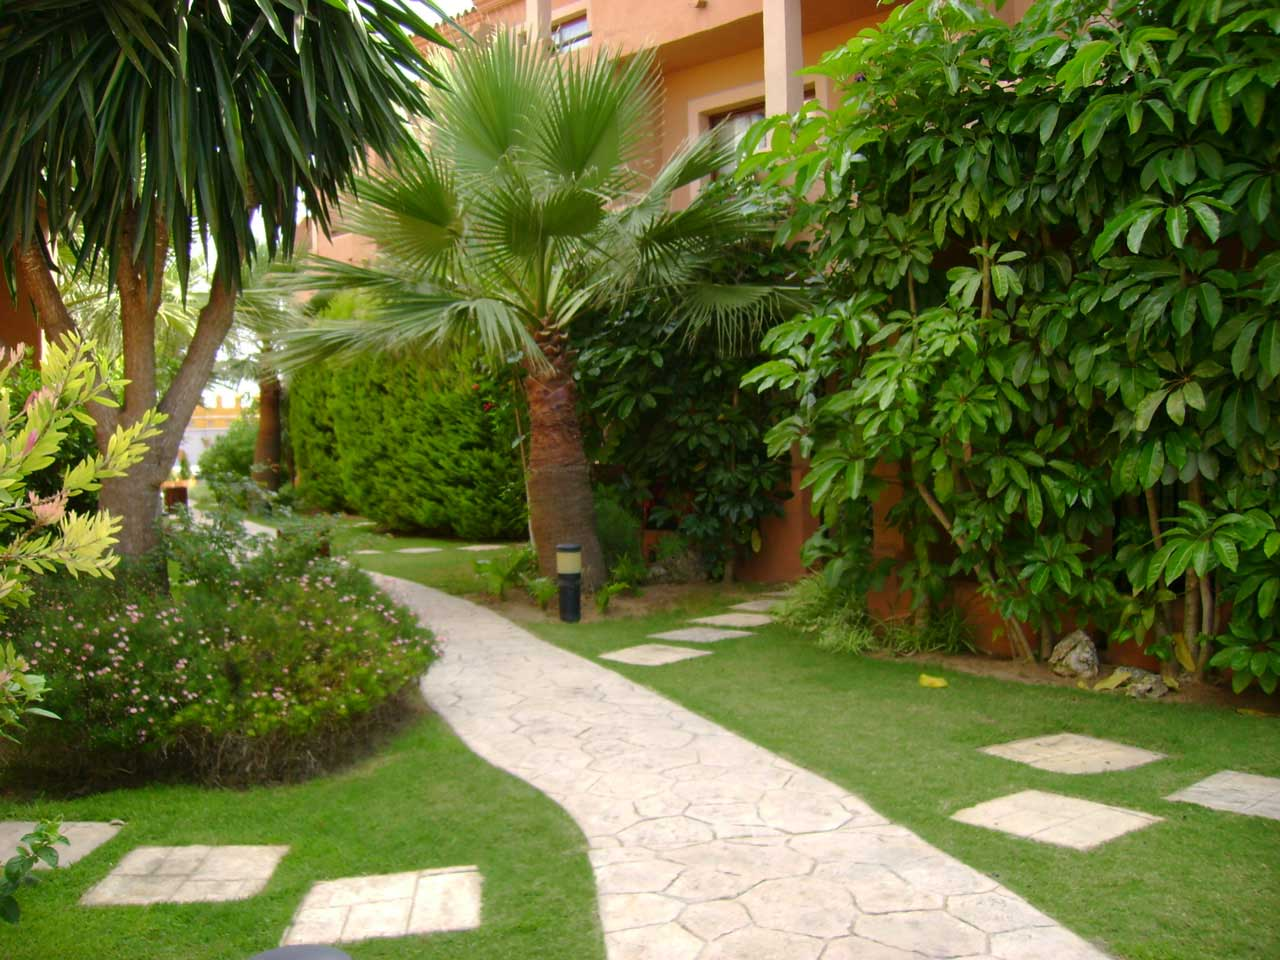 Arte y jardiner a jardiner a ecol gica for Figuras para jardines